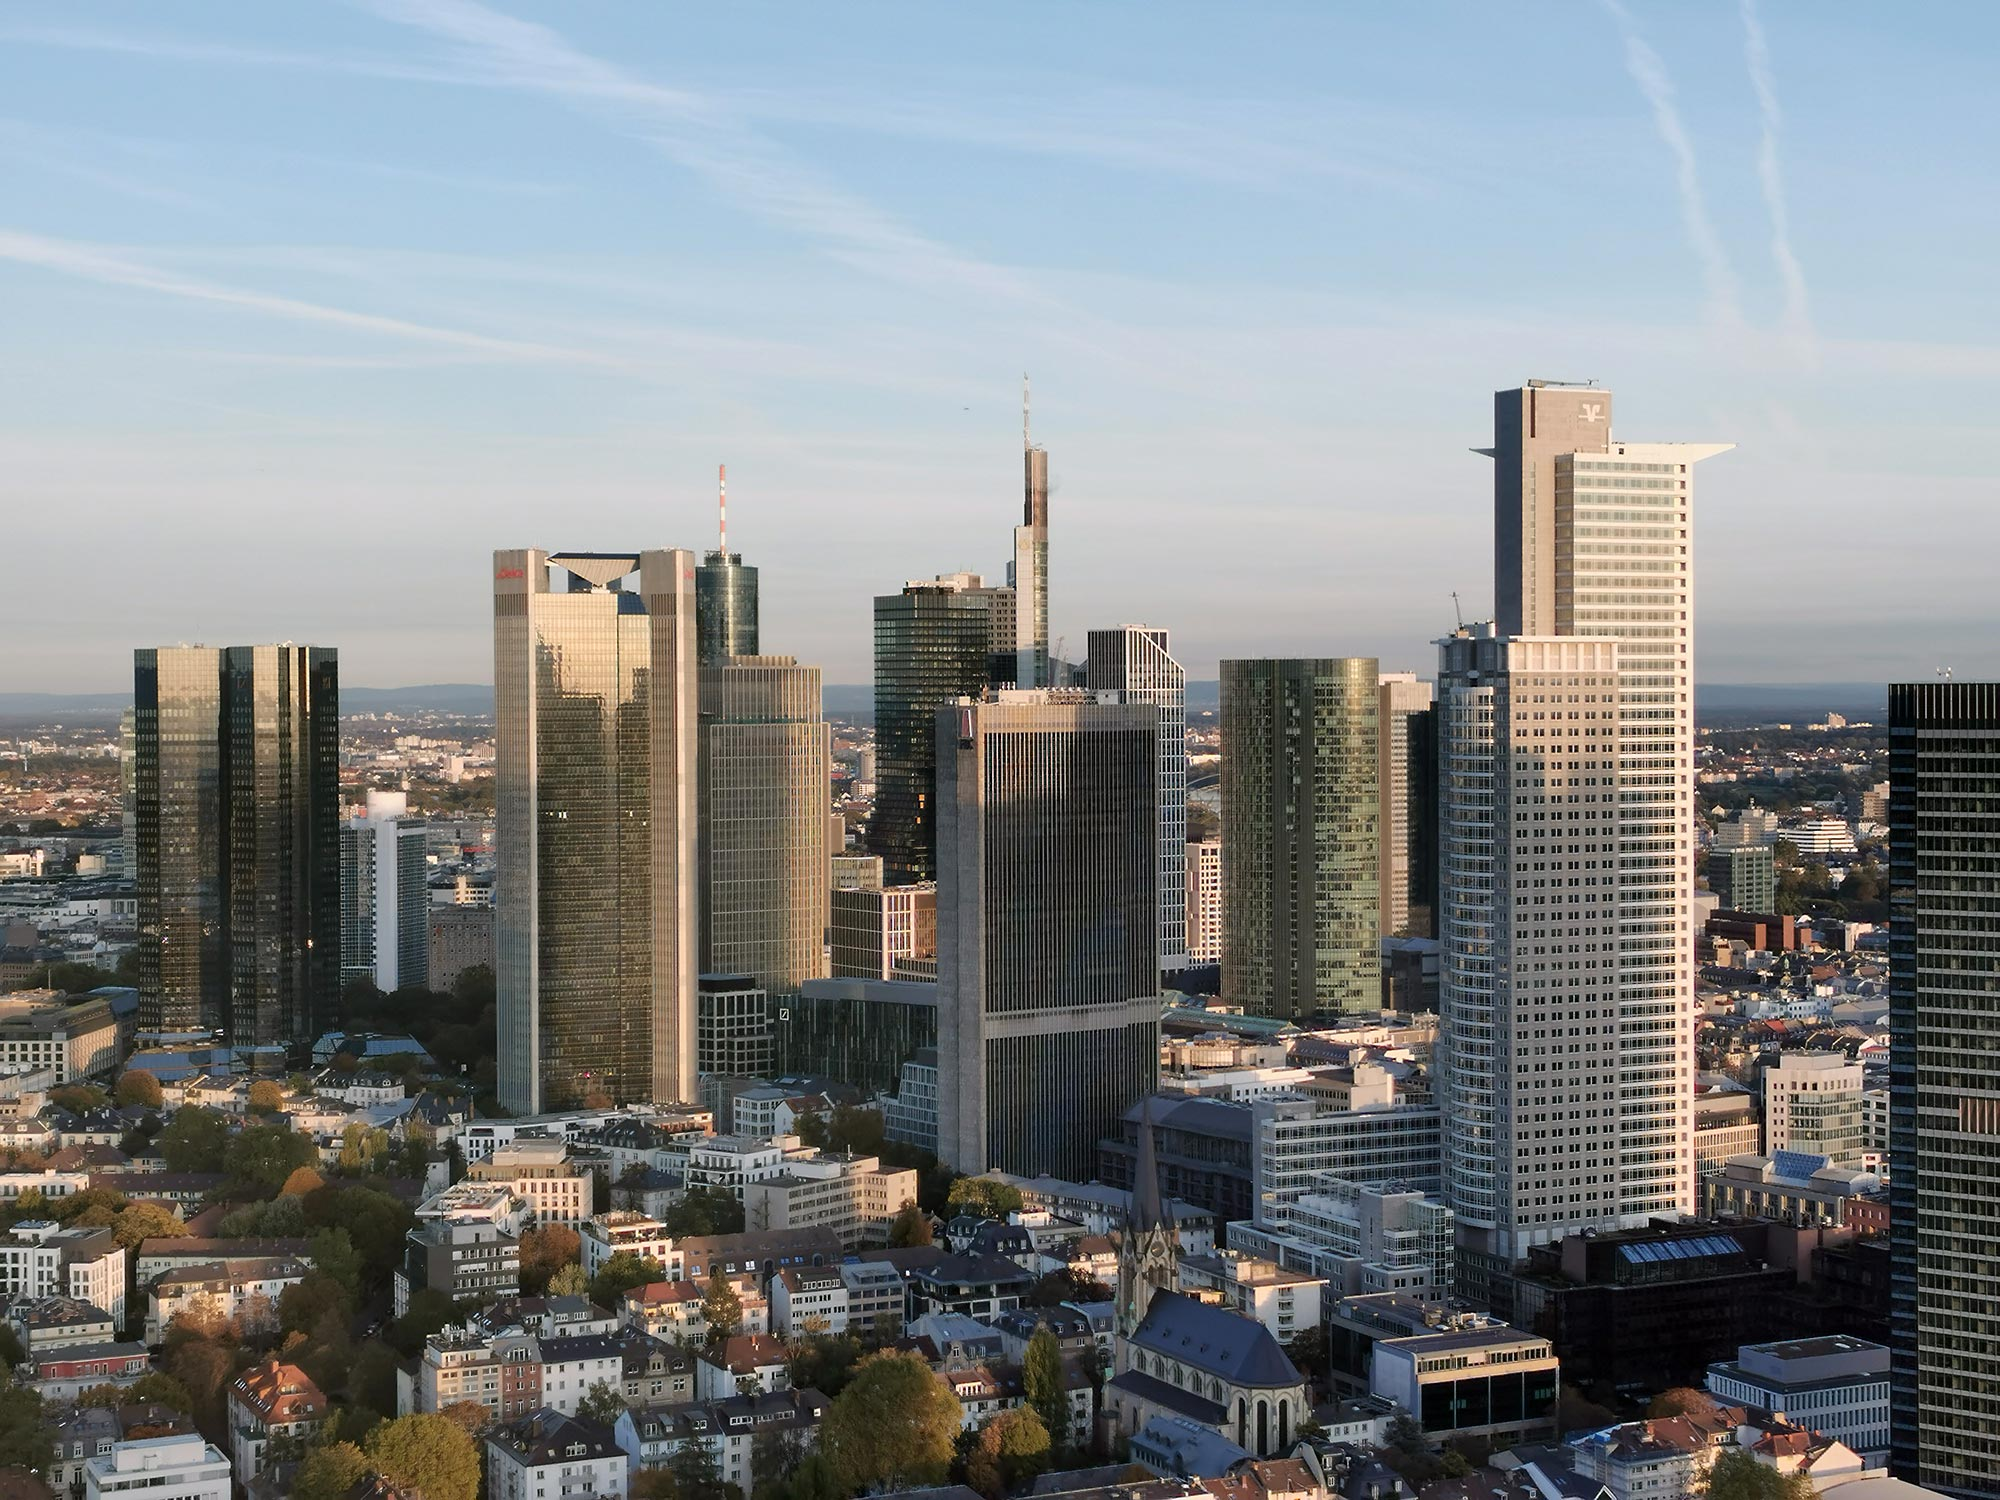 Hochhäuser Frankfurt Foto - Panoramabild Frankfurt a.M. Skyline - Stockbild kostenlos - Panorama Frankfurt herunterladen - Foto Nr. 783-881-046